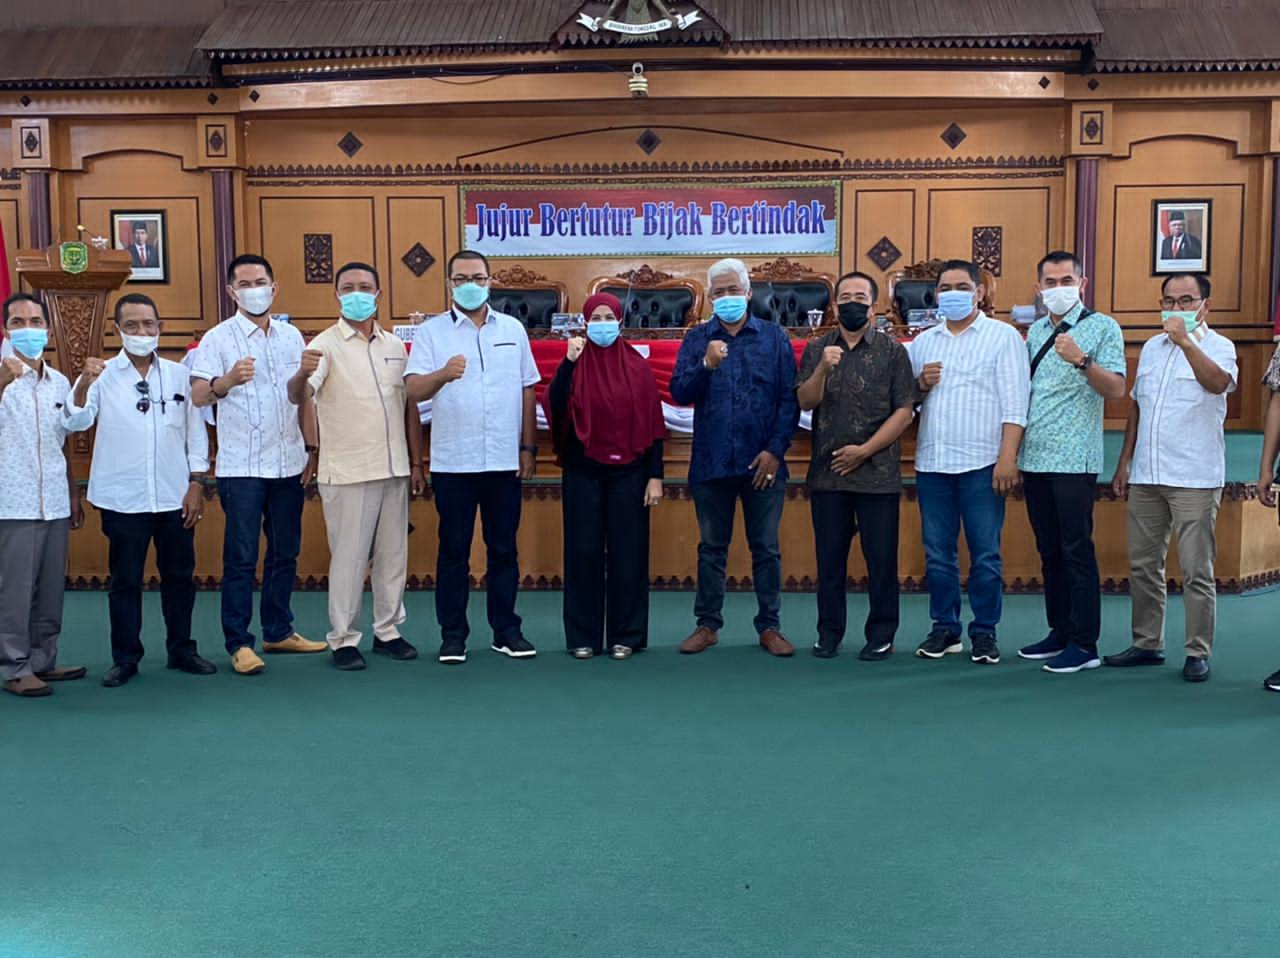 Rina Febriani Sambut Kunjungan DPRD Indragiri Hilir